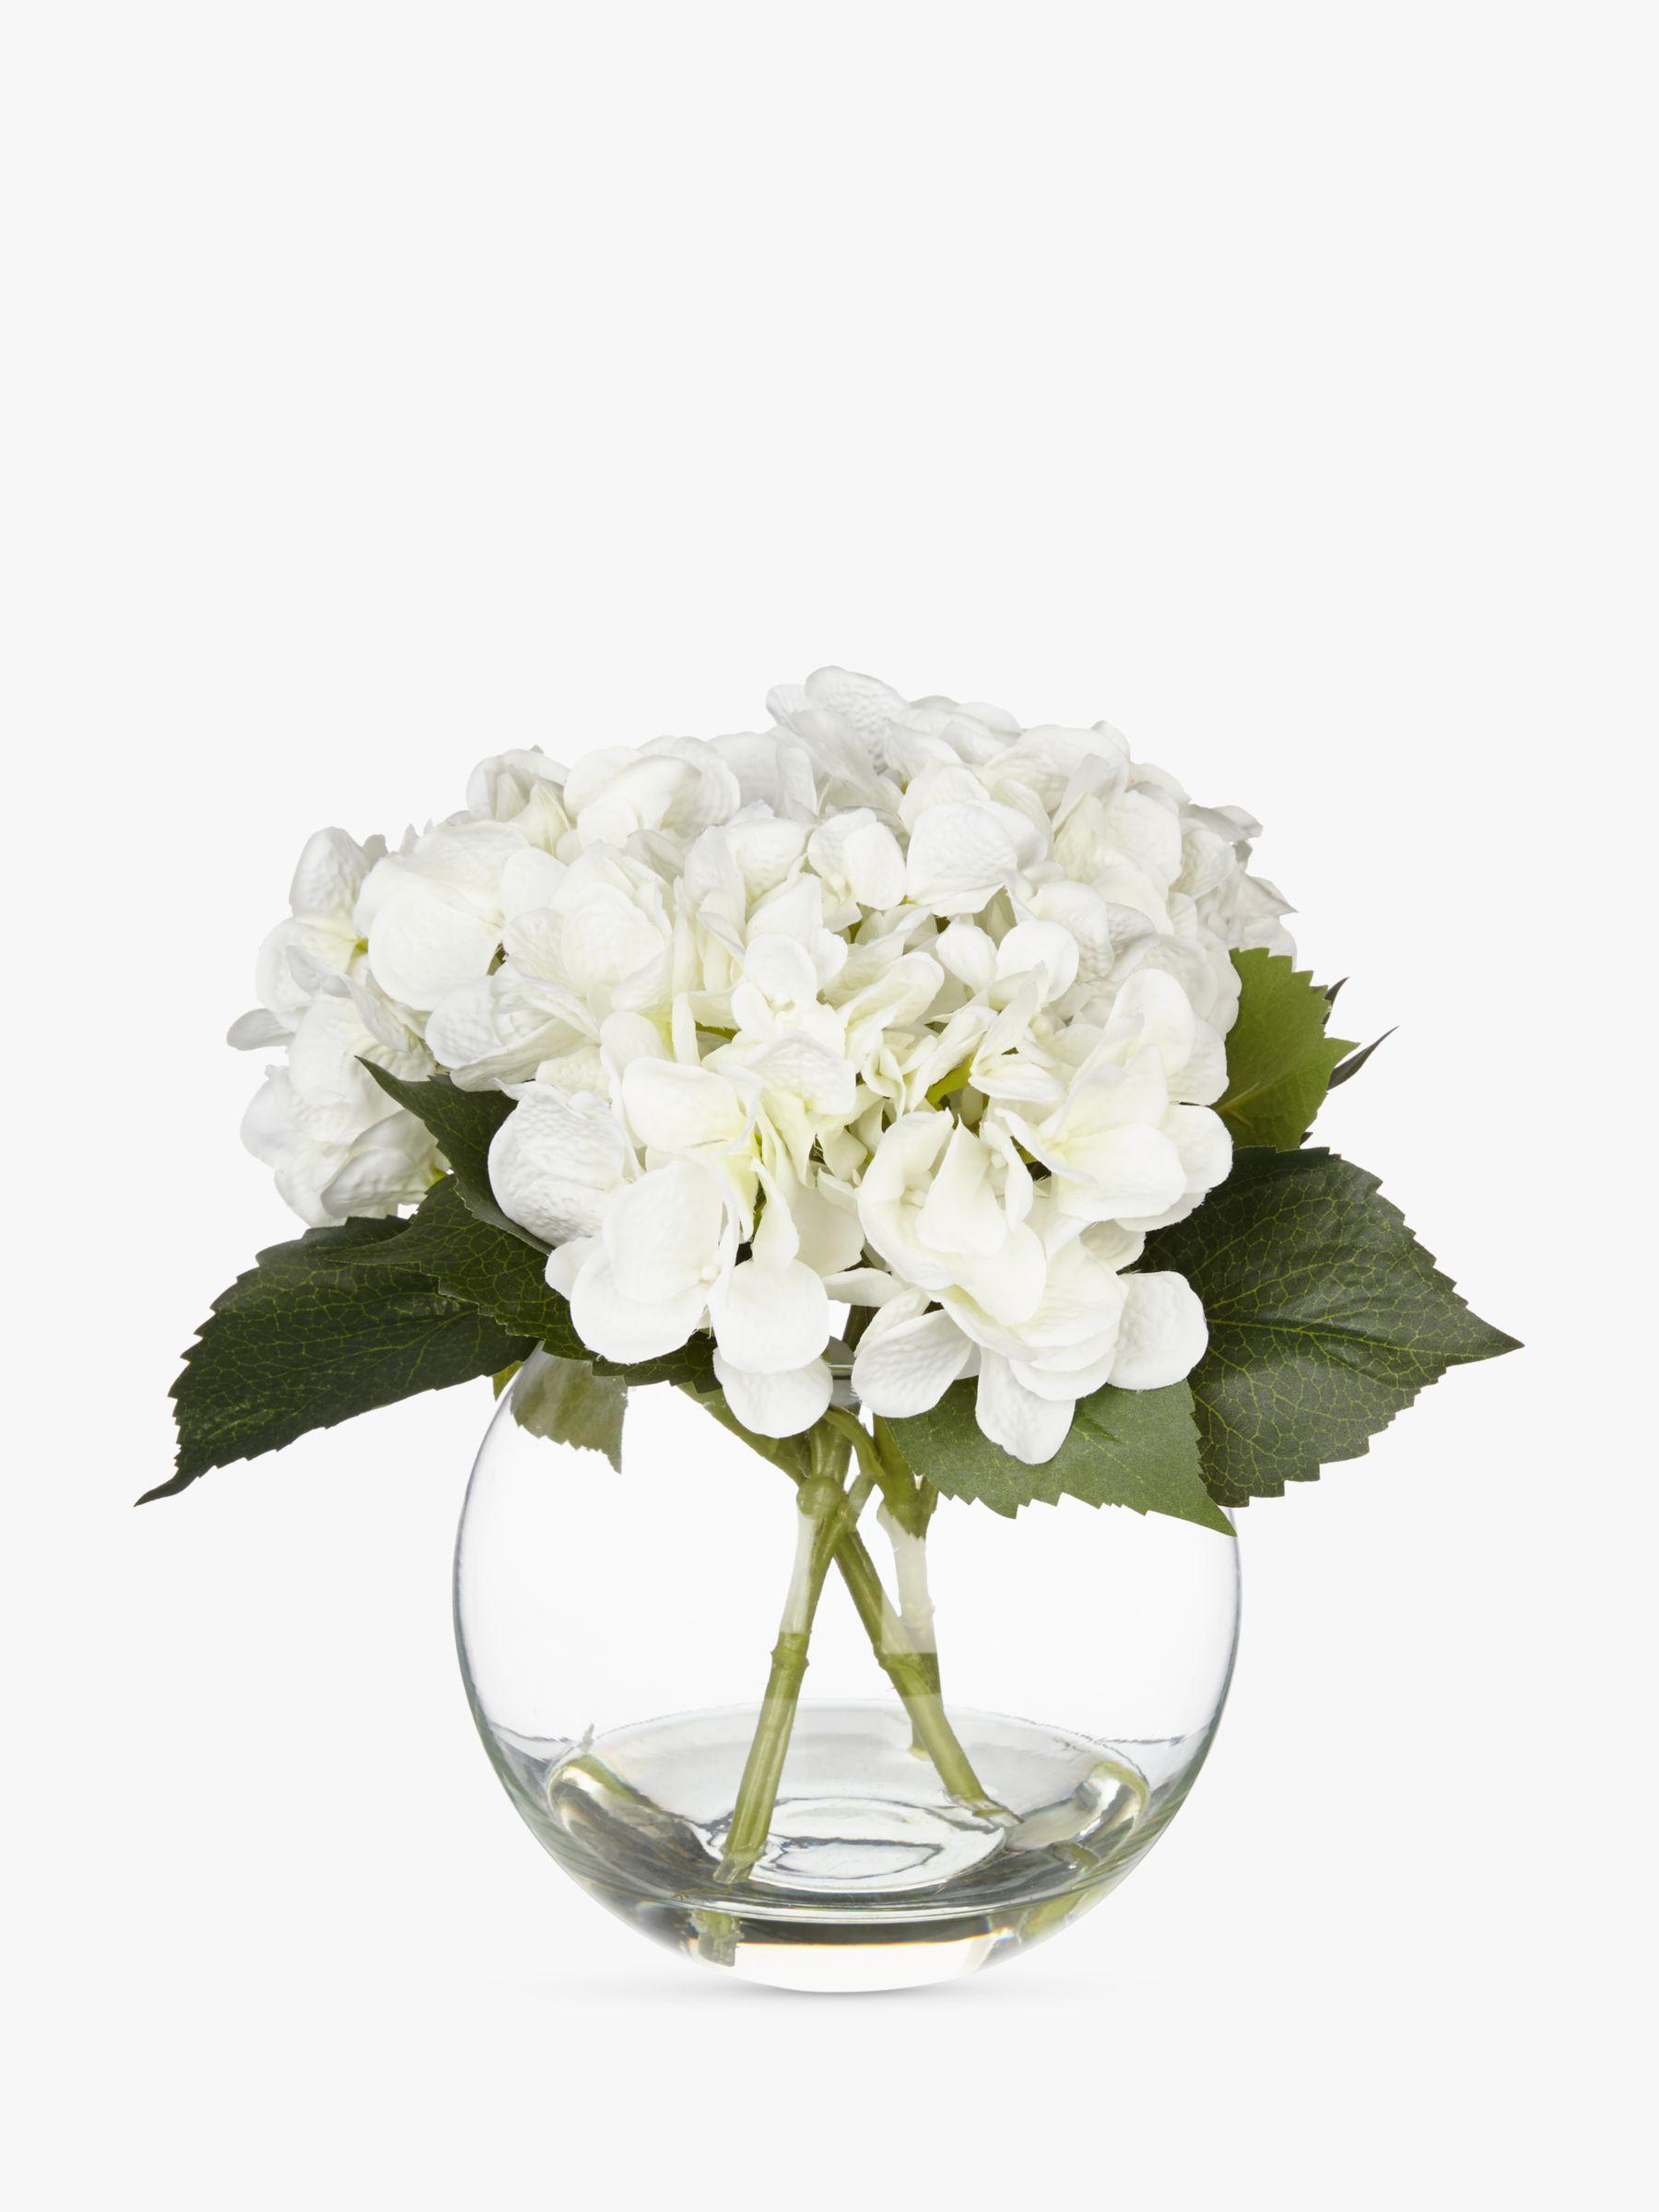 Peony Artificial Peony Hydrangea in Fishbowl, White